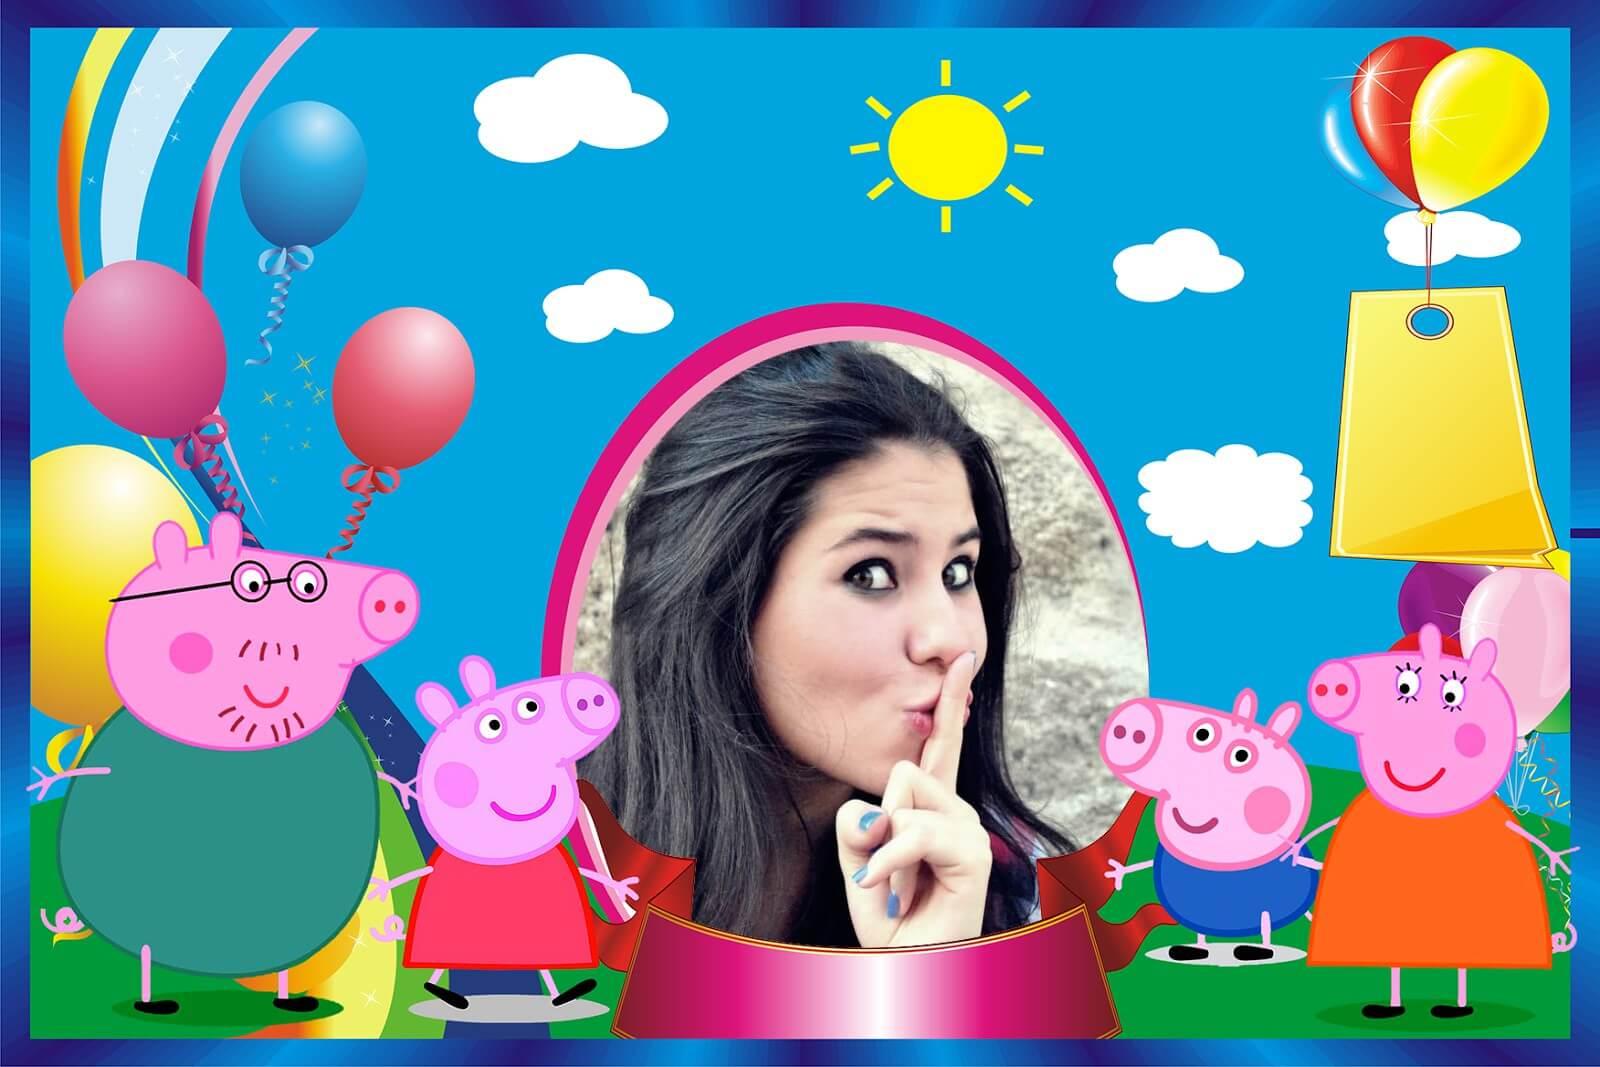 moldura-de-aniversario--peppa-pig-e-familia